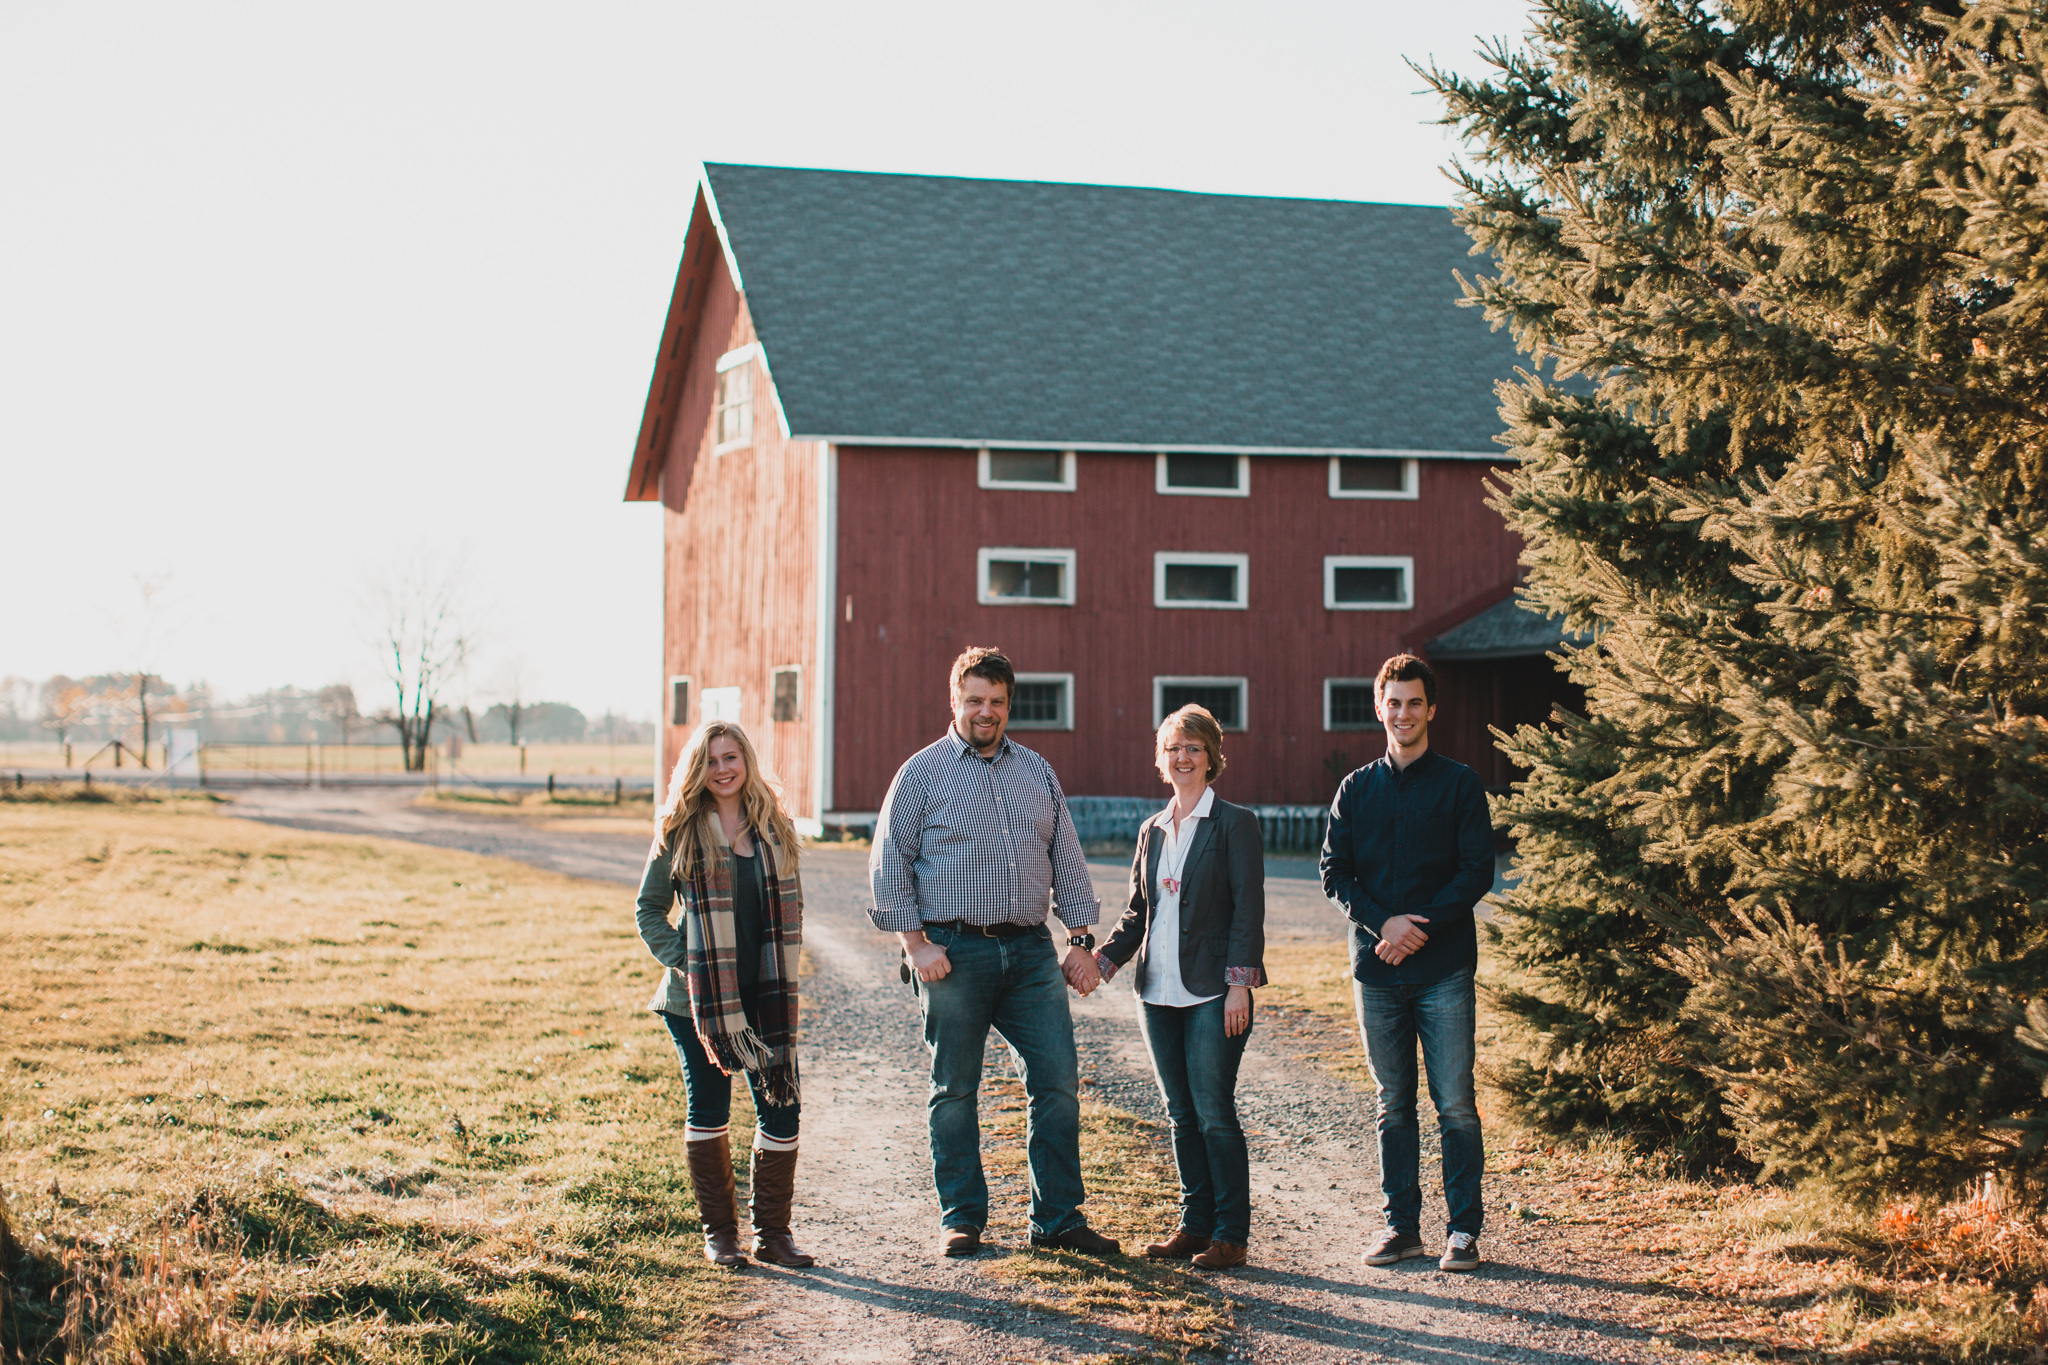 Family Photo Locations - Red Barn - Ottawa